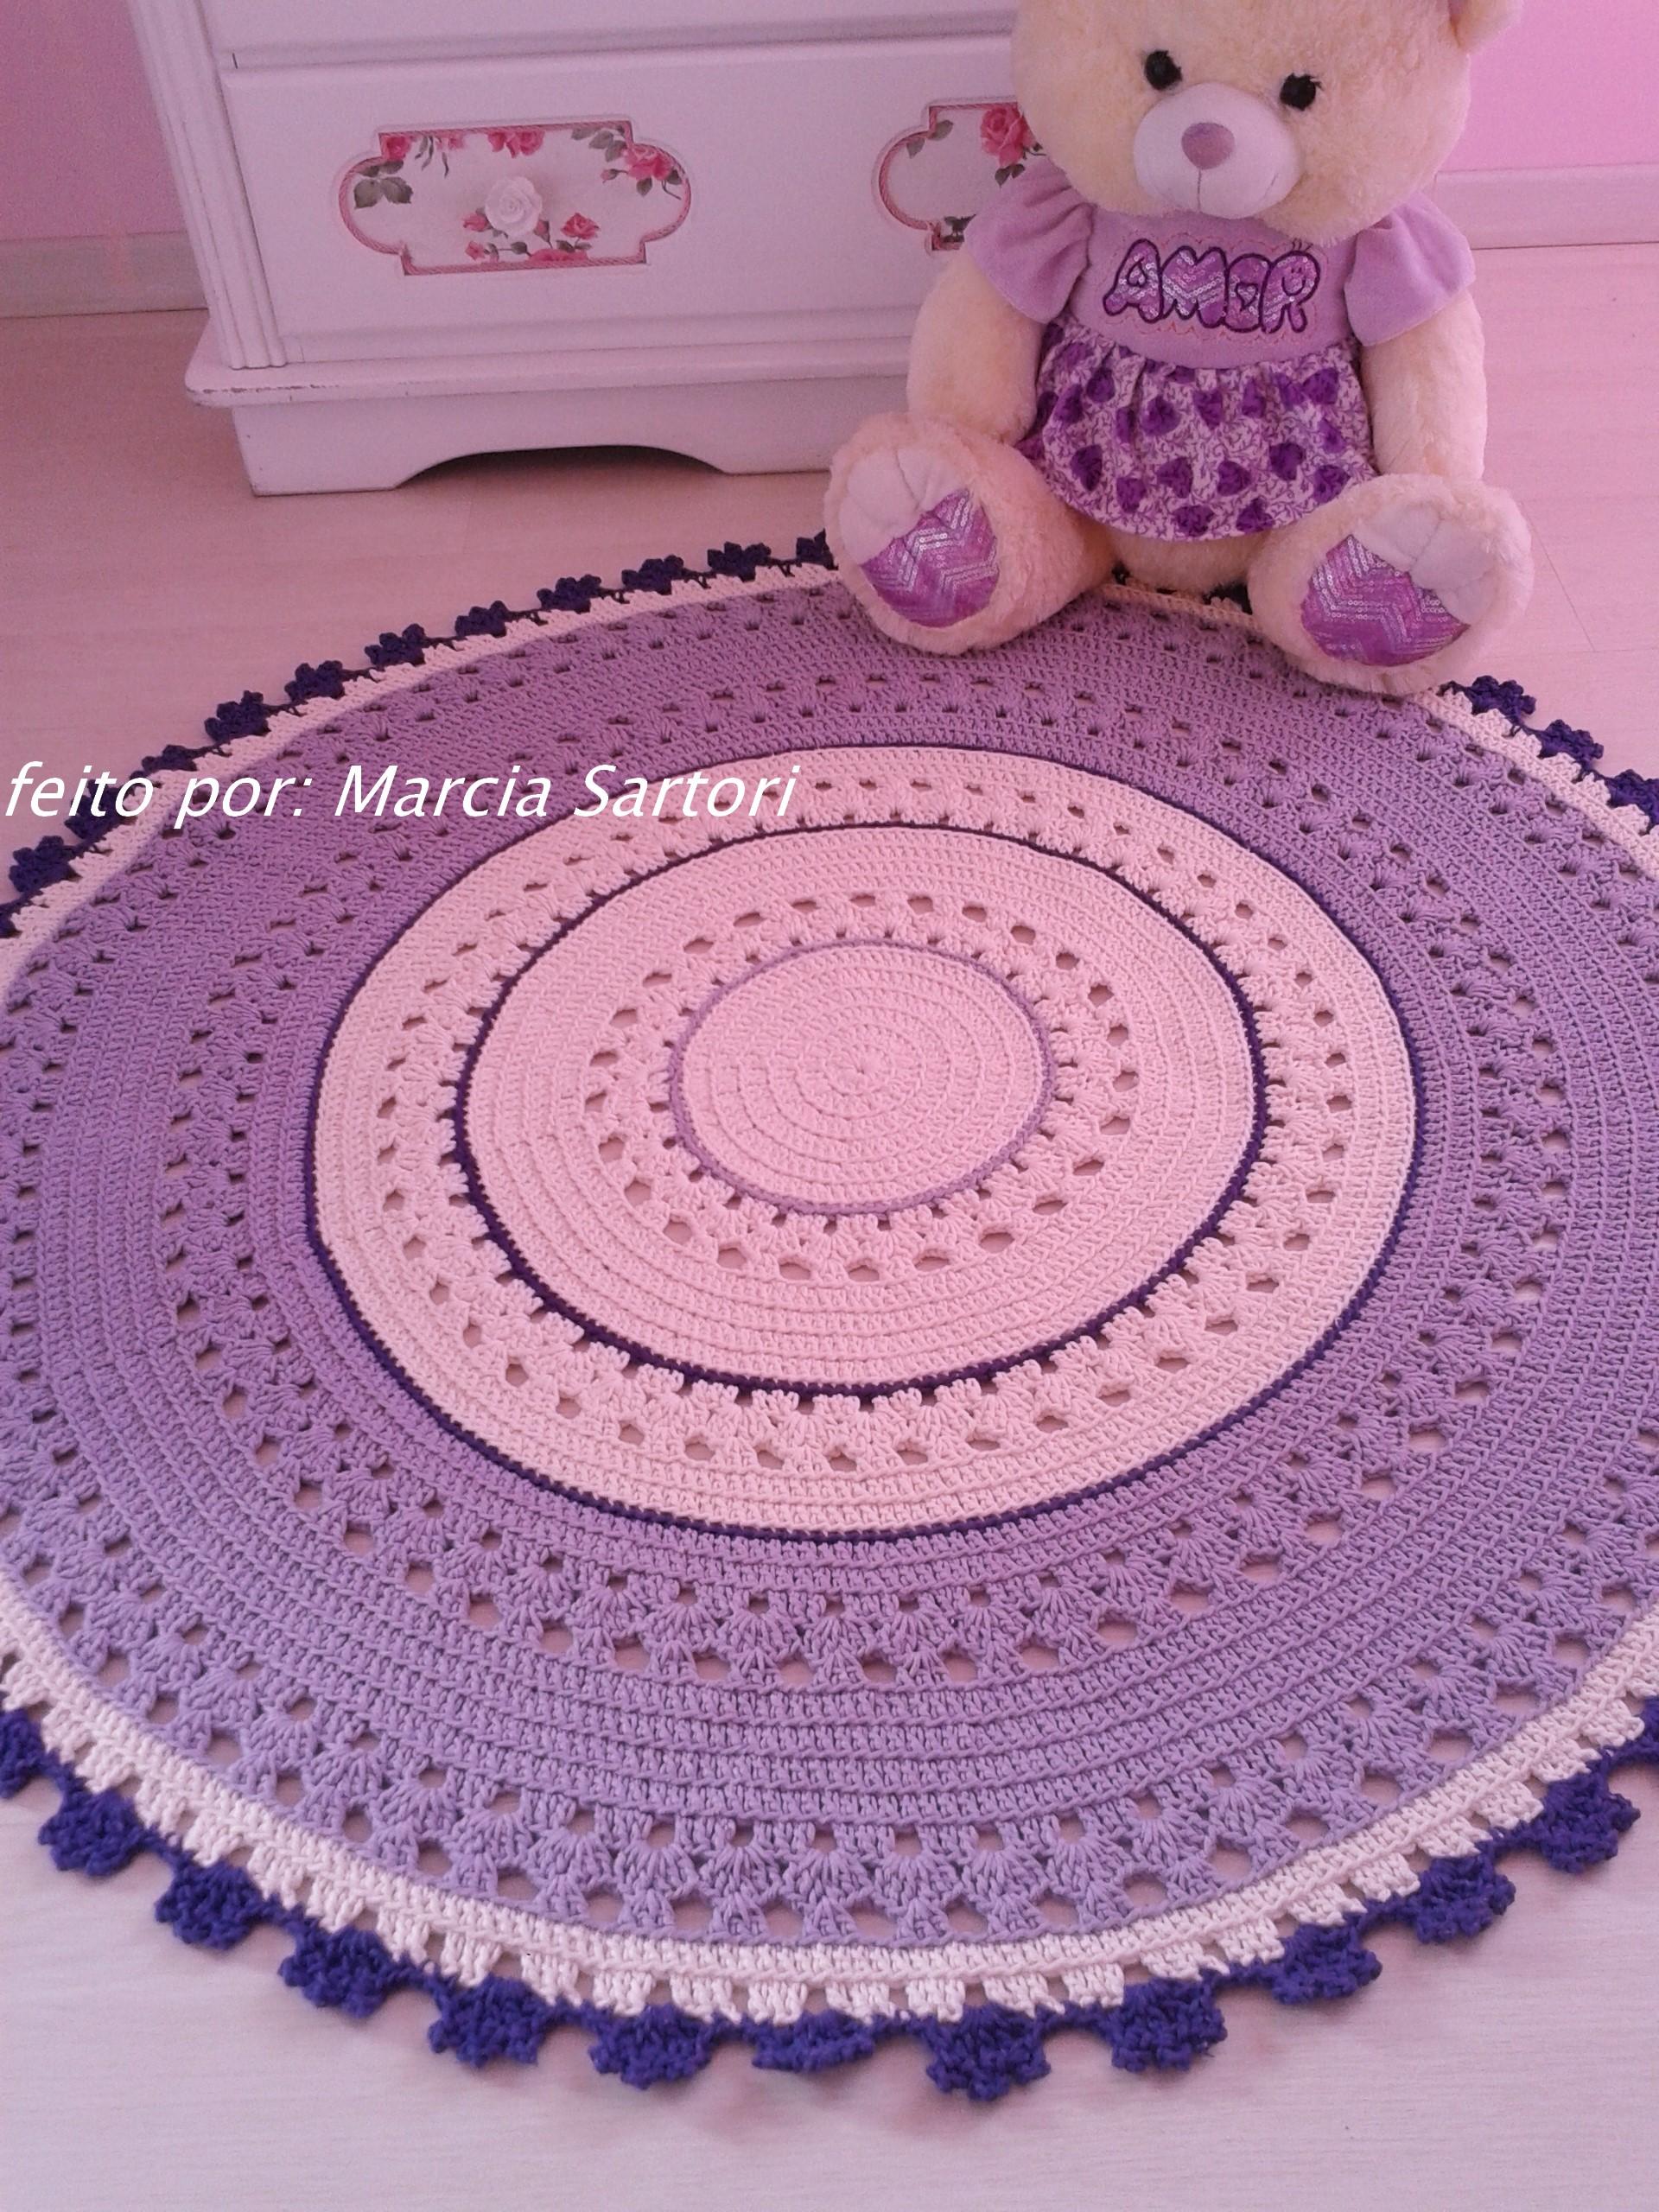 Tapete tons lilas Marcia Sartori Elo7 ~ Tapete Para Quarto De Bebe Lilas